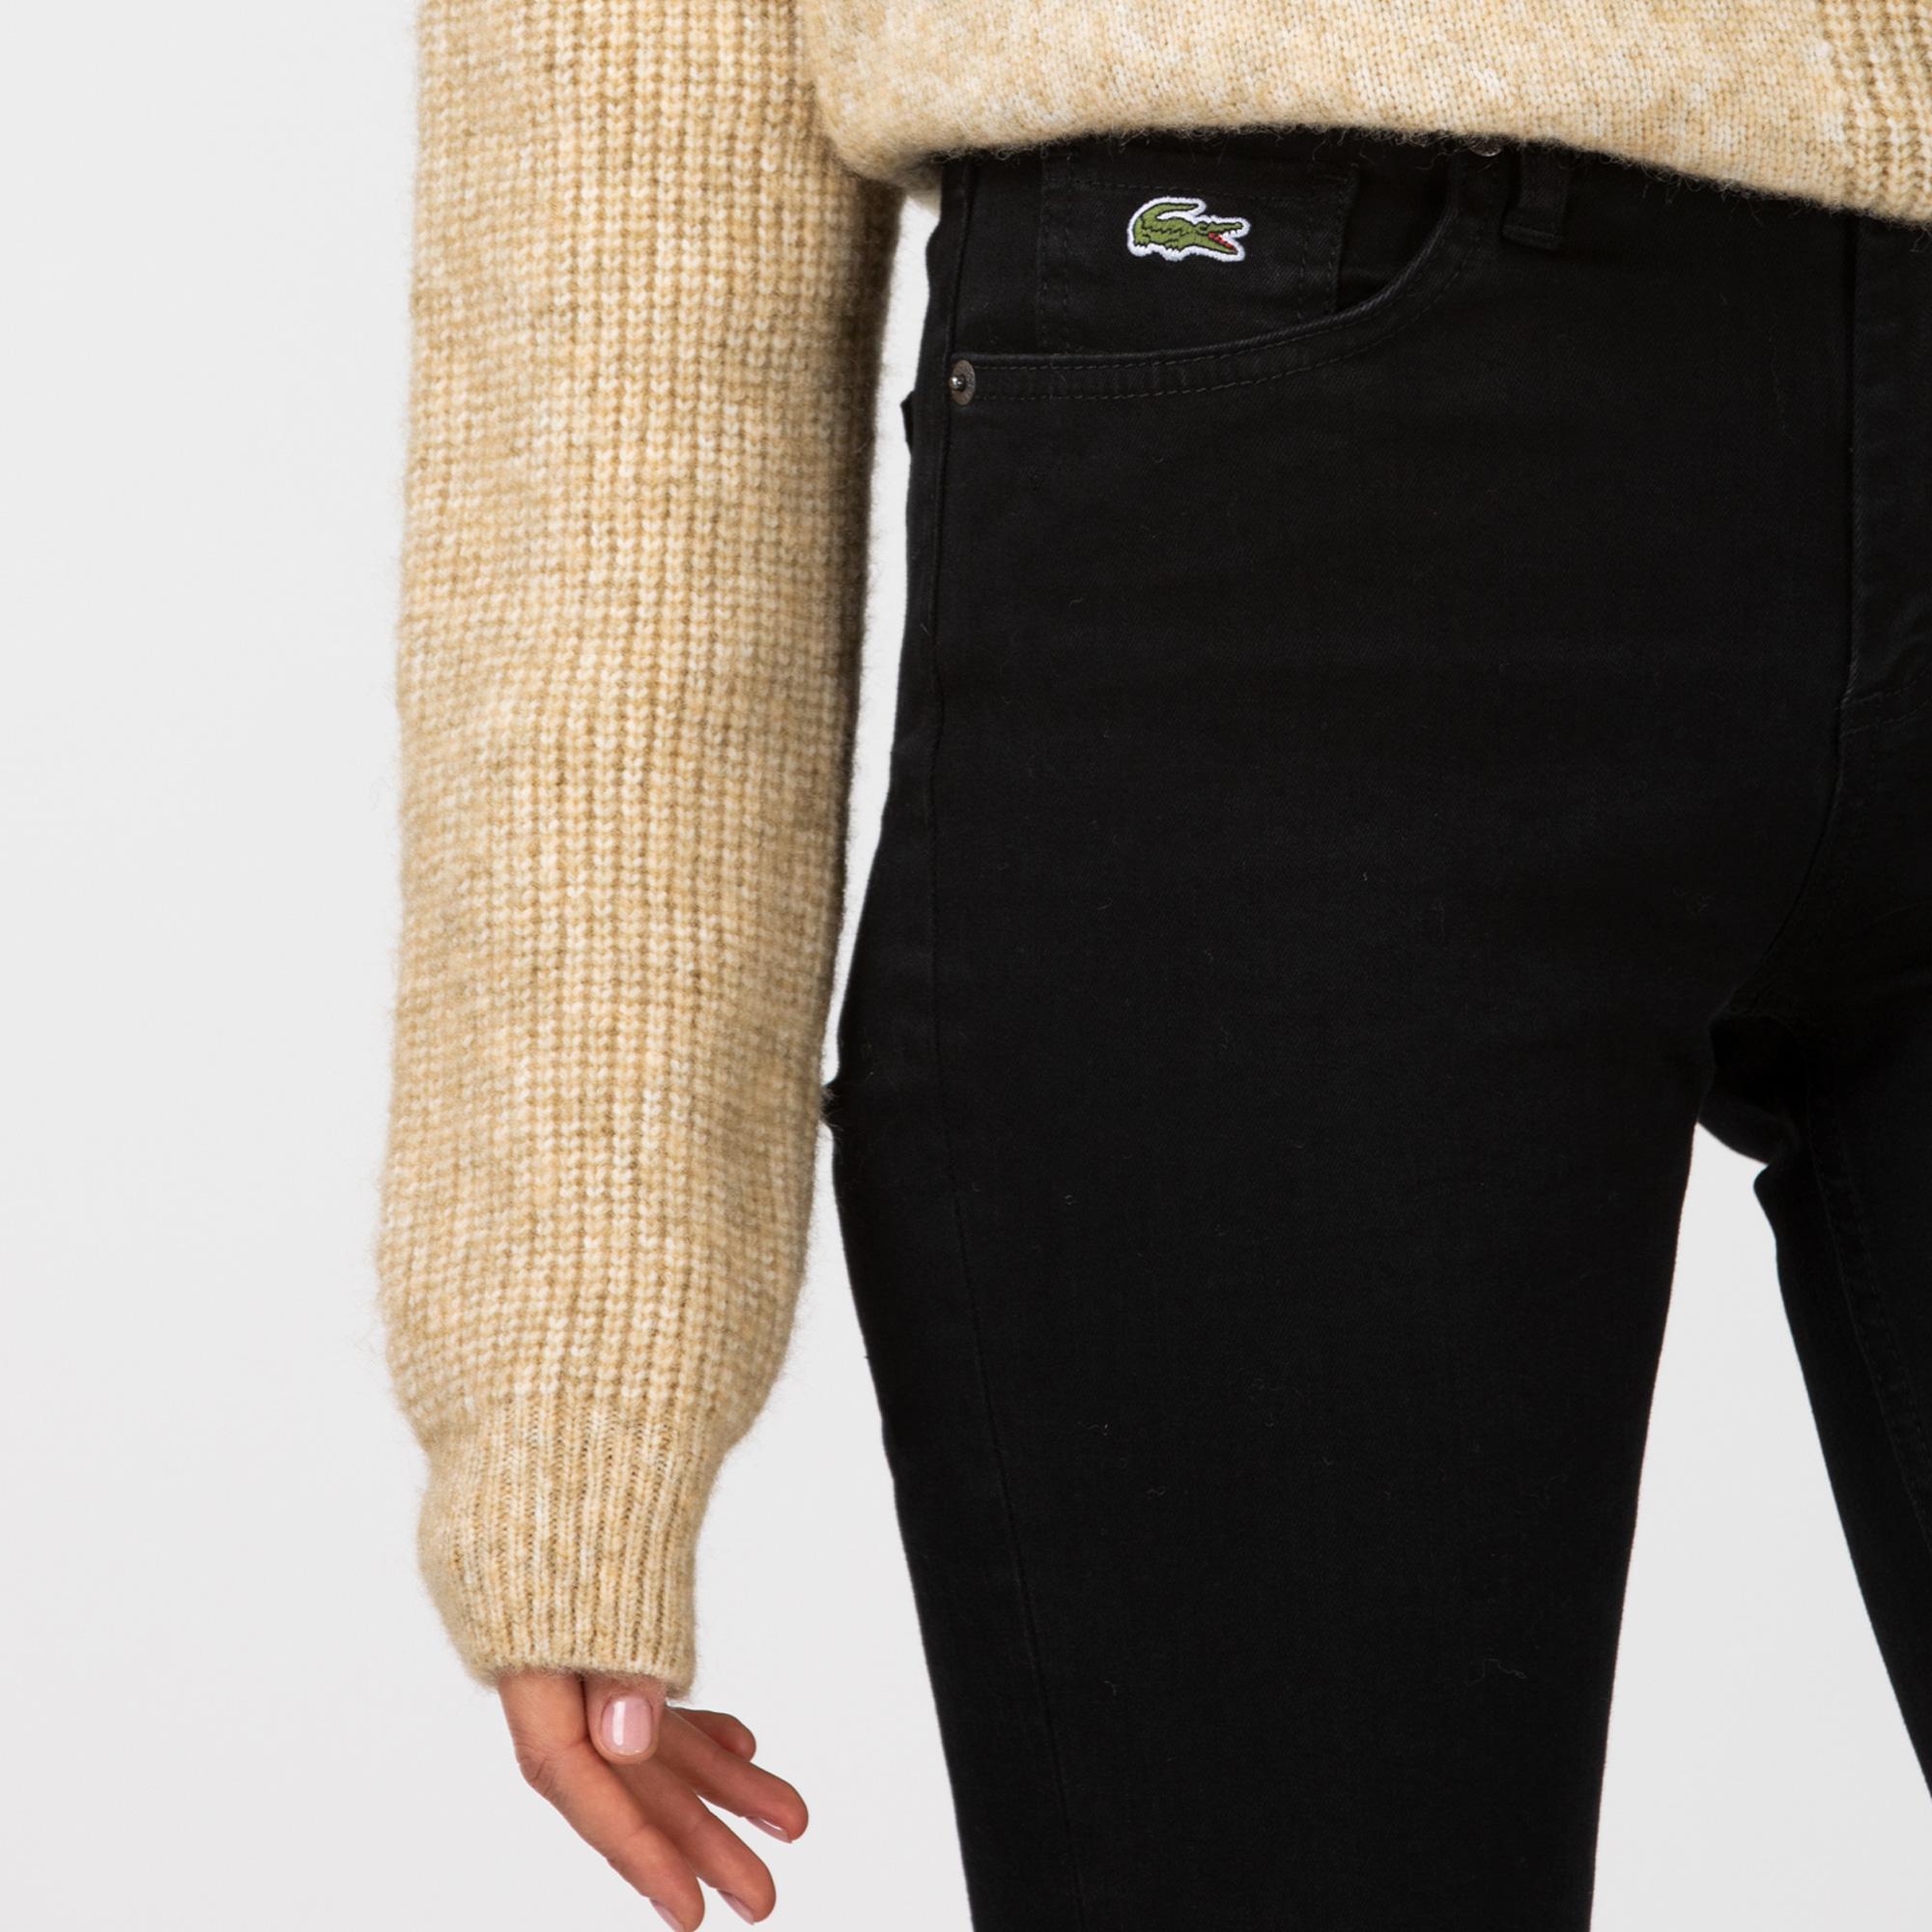 Lacoste Kadın Slim Fit Streç Denim Siyah Pantolon